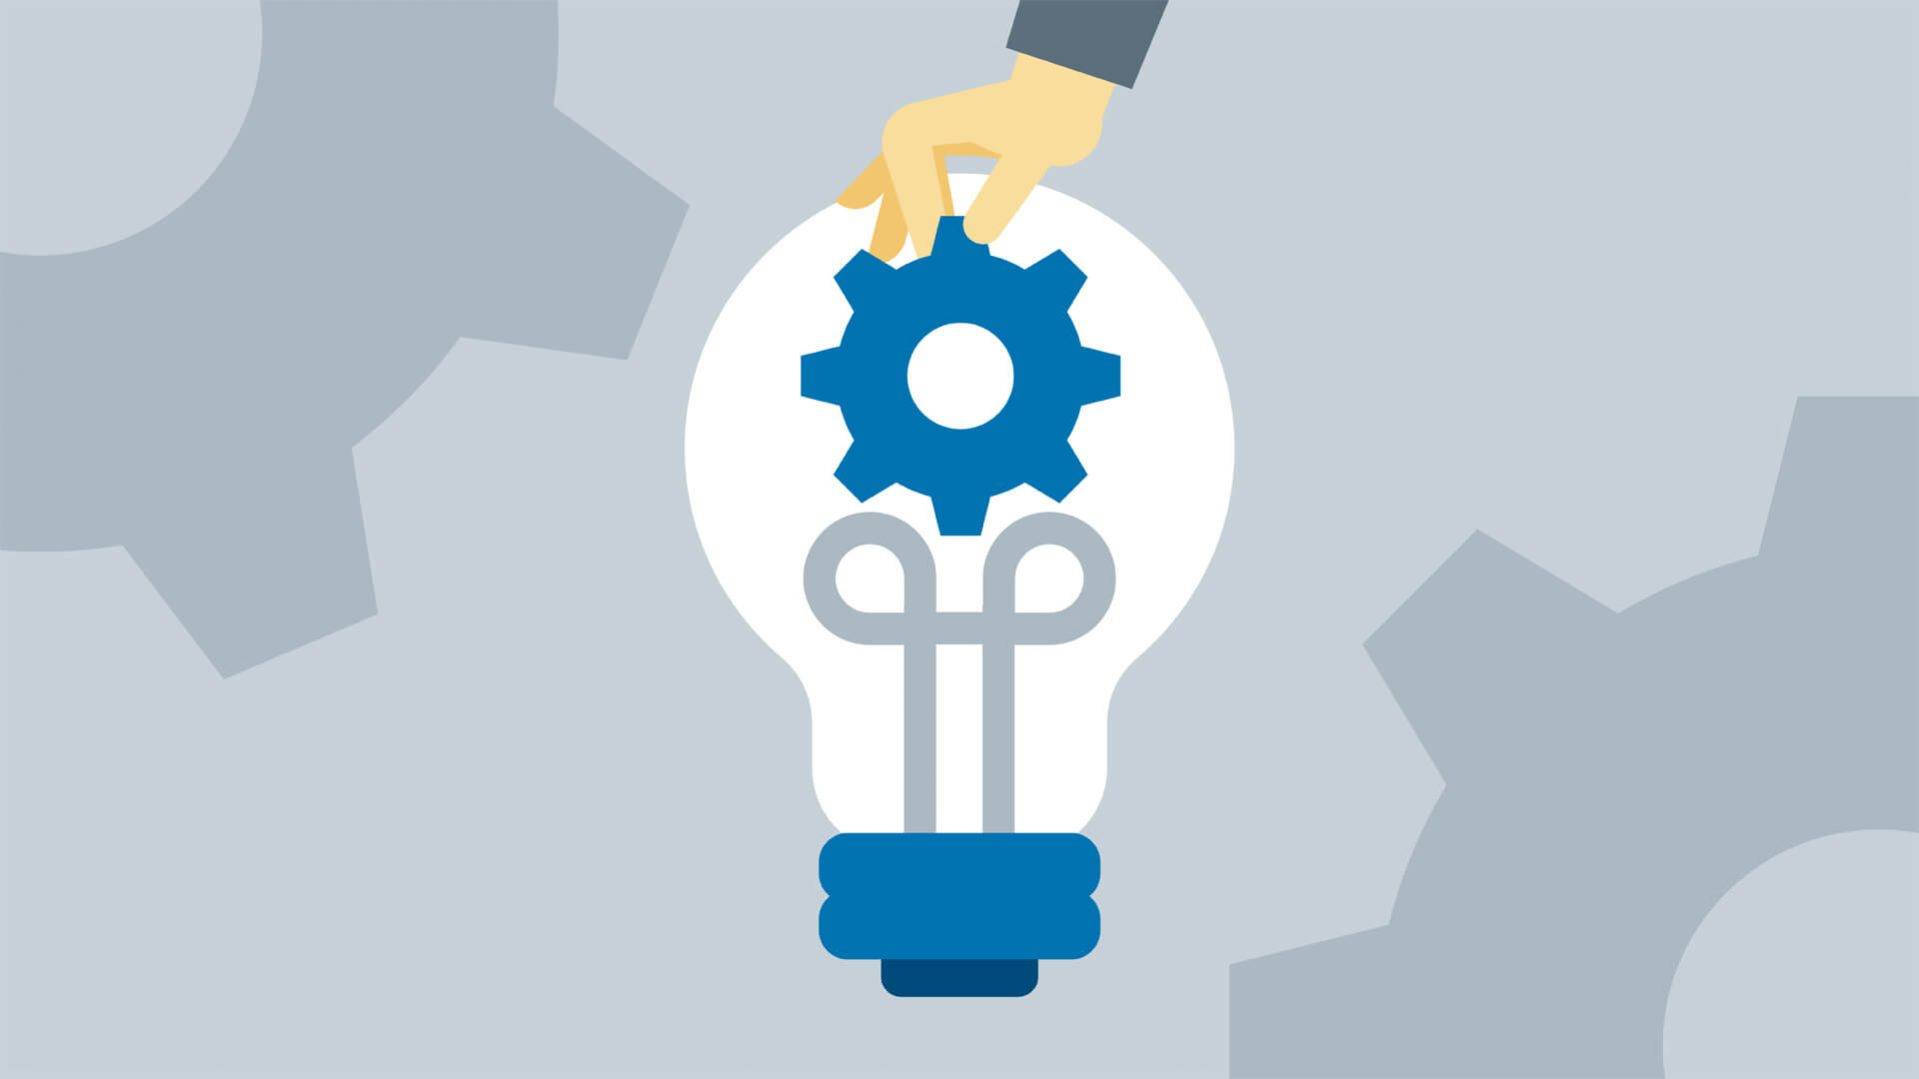 Developing Creative Ideas